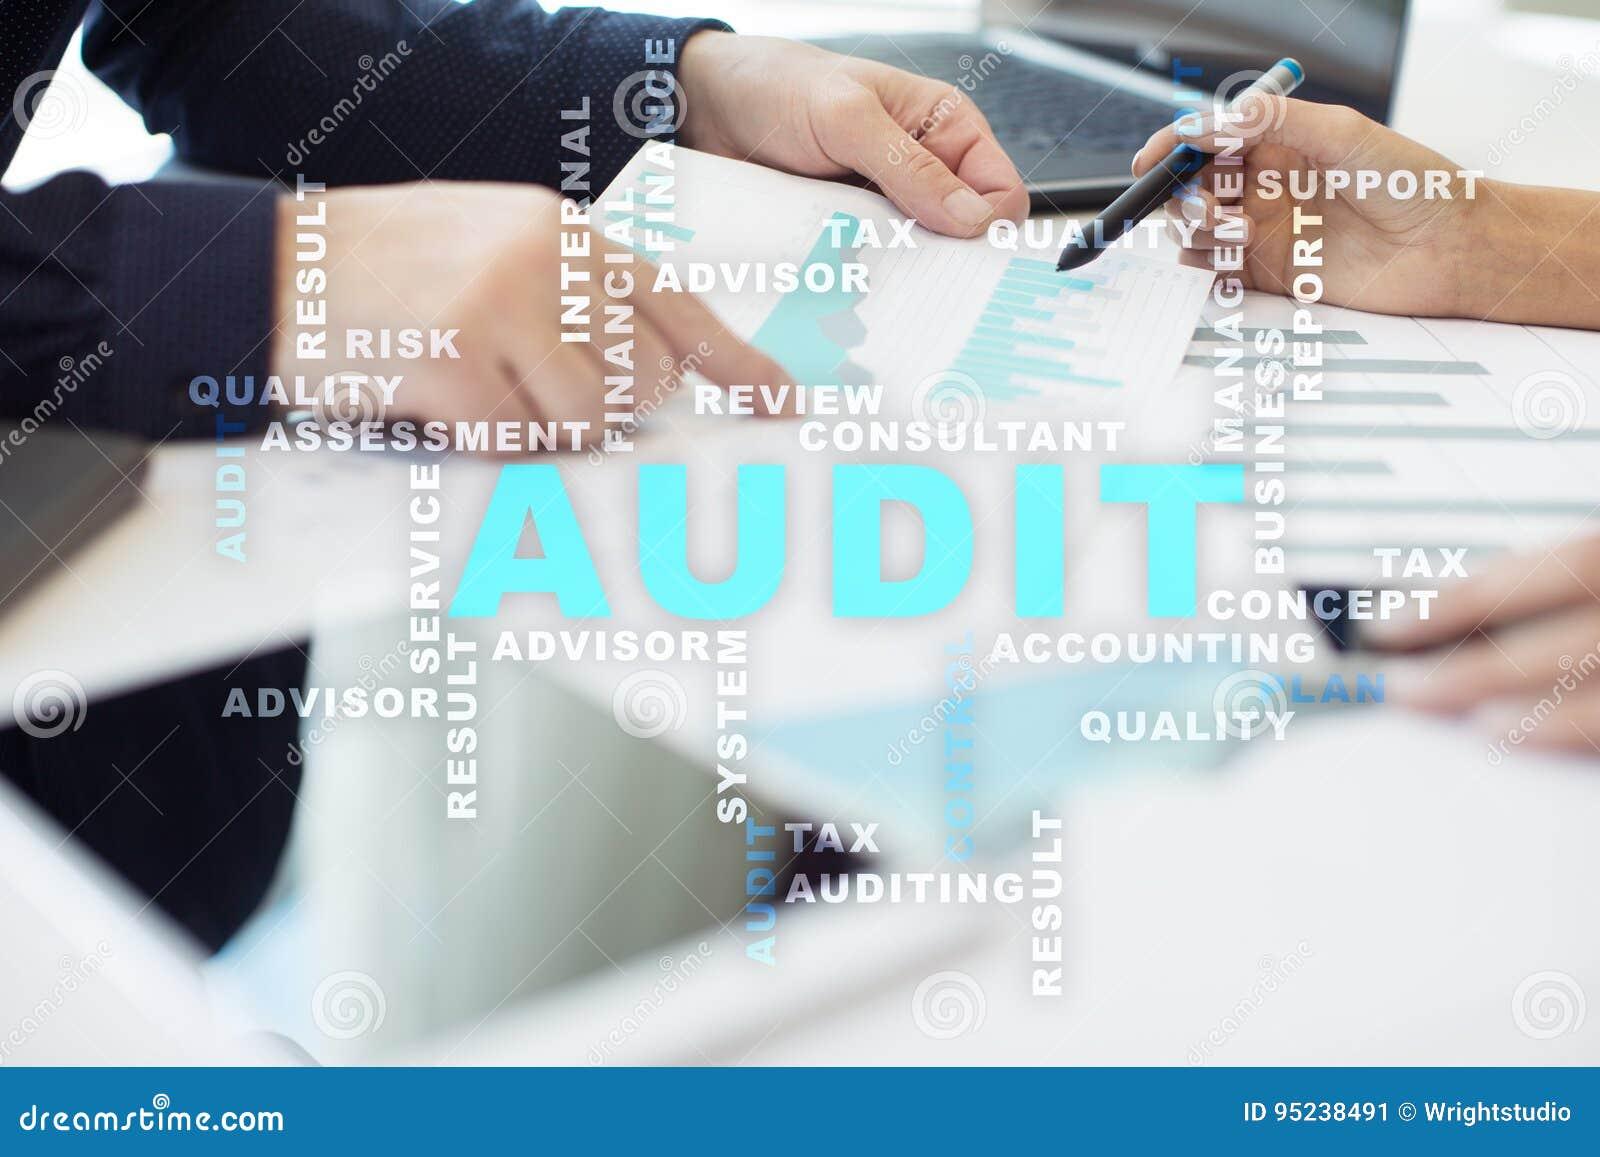 Audit Business Concept  Auditor  Compliance  Words Cloud  Stock